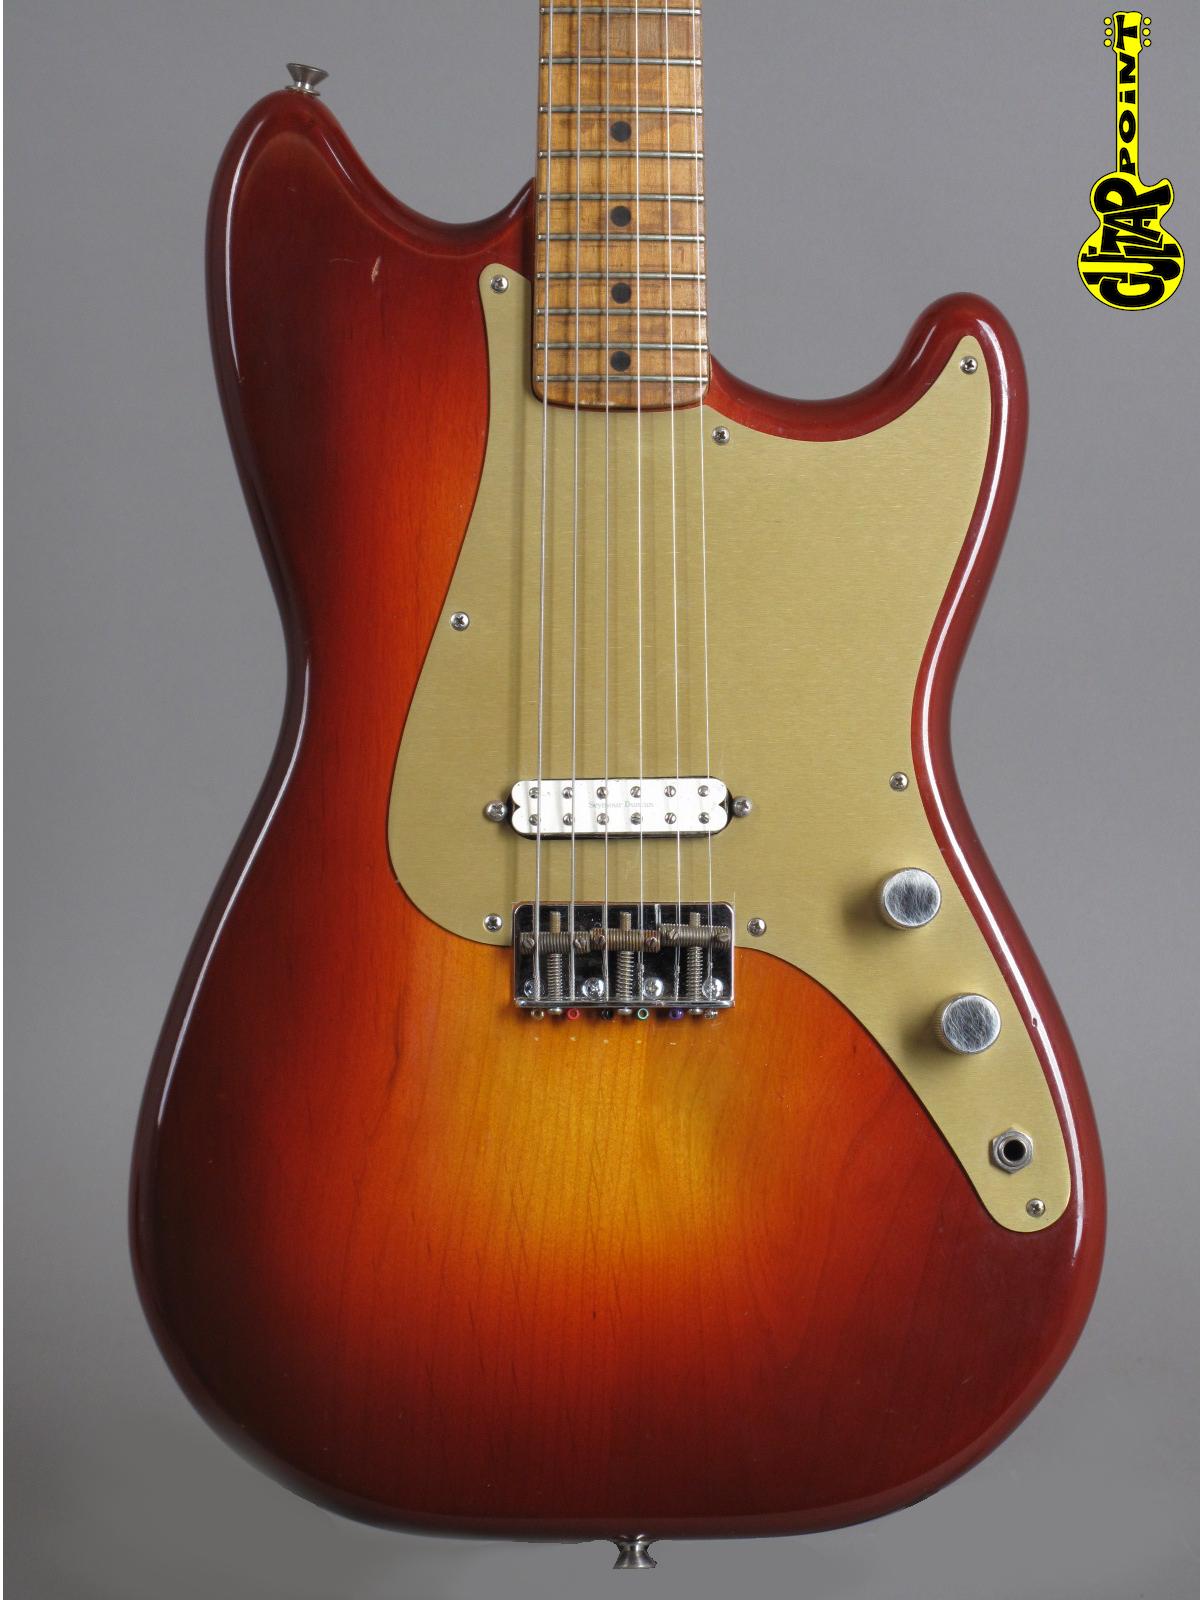 1959 Fender Musicmaster Mod - Sunburst